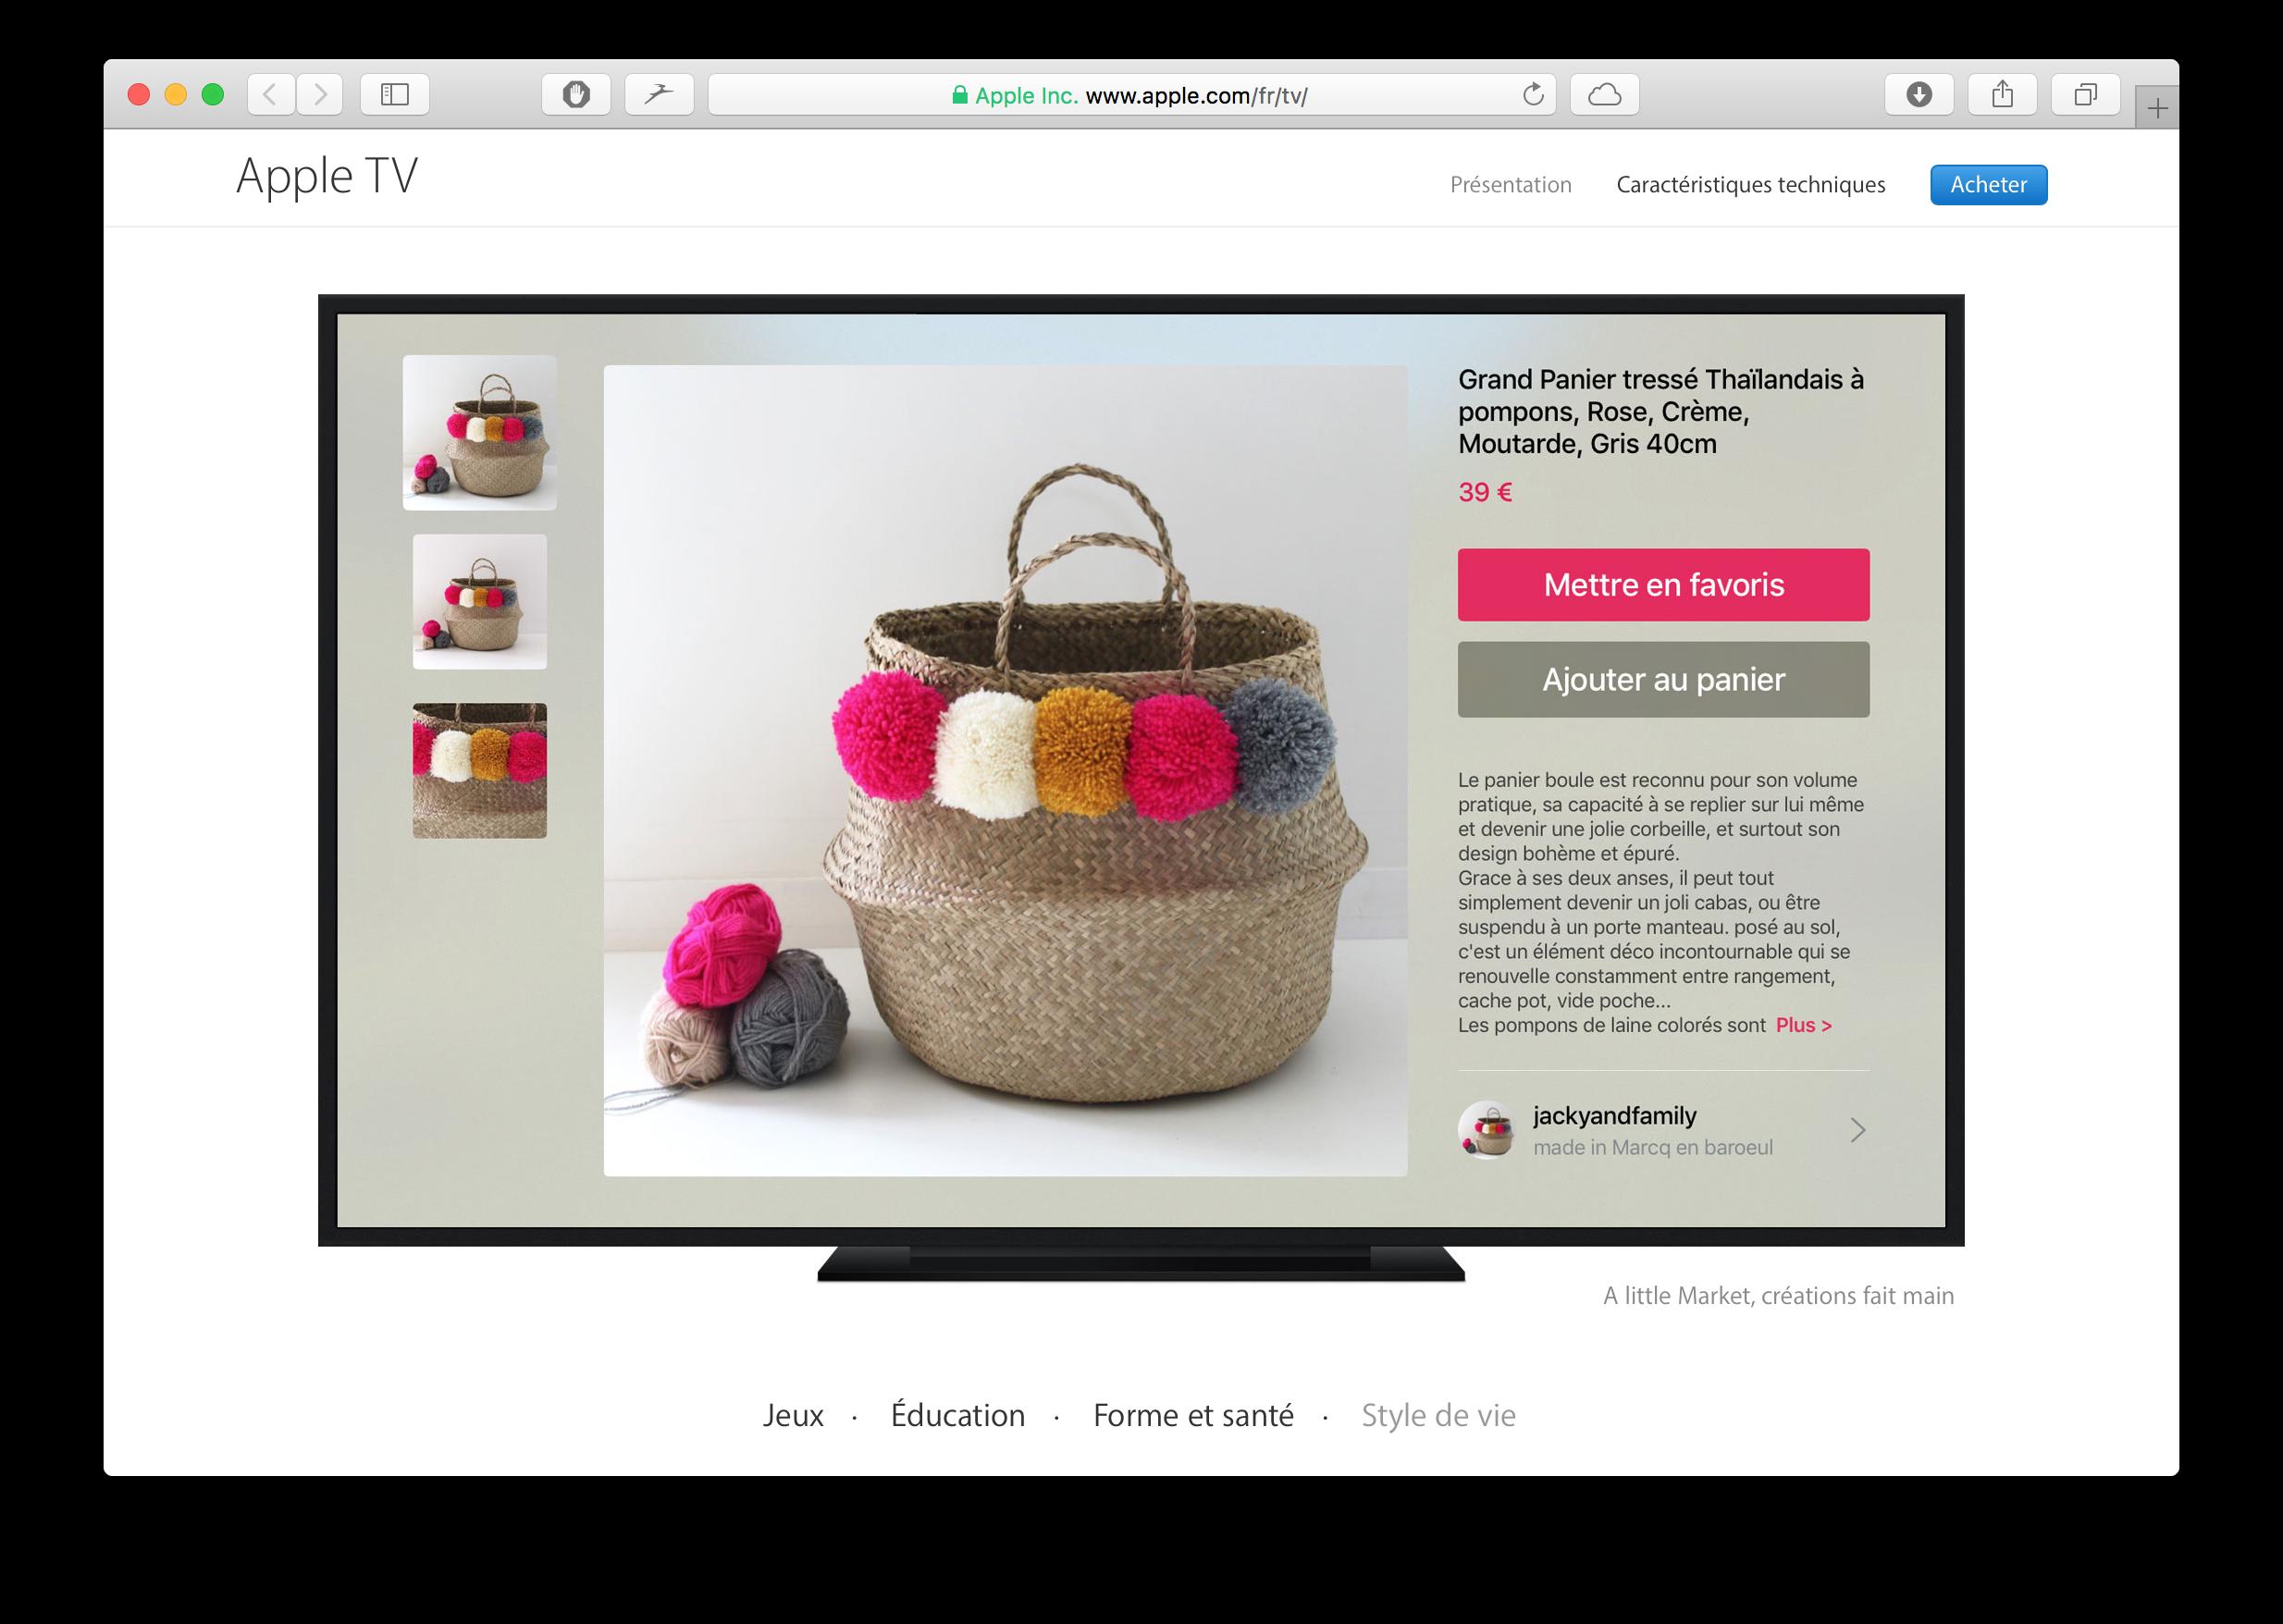 Apple Website featured